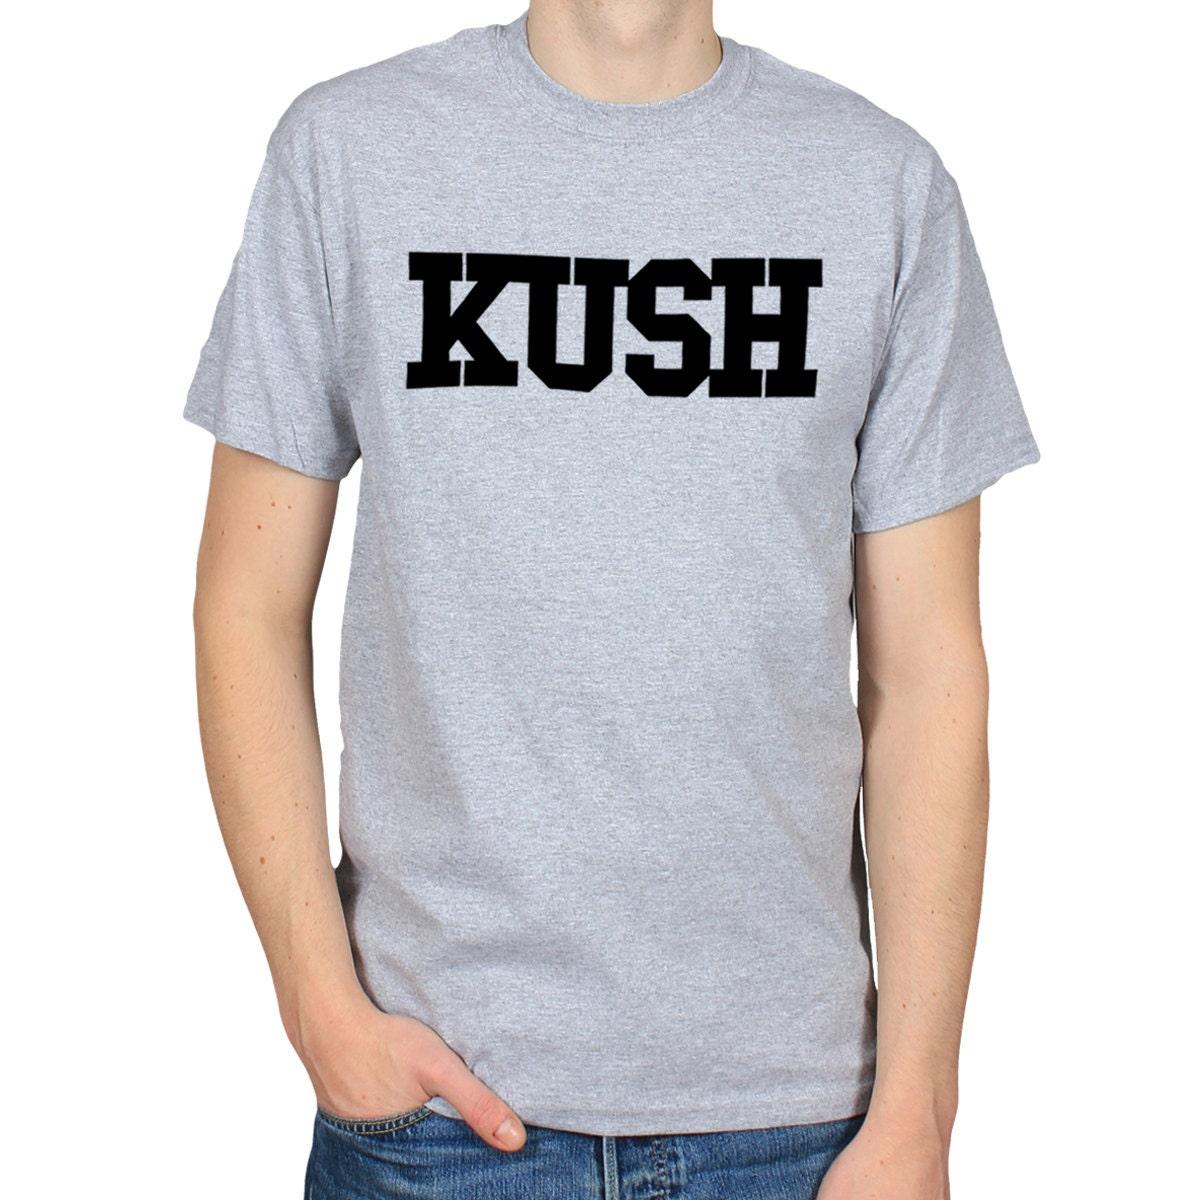 Kush Logo T Shirt Cannabis Shirt Marijuana Weed Shirt